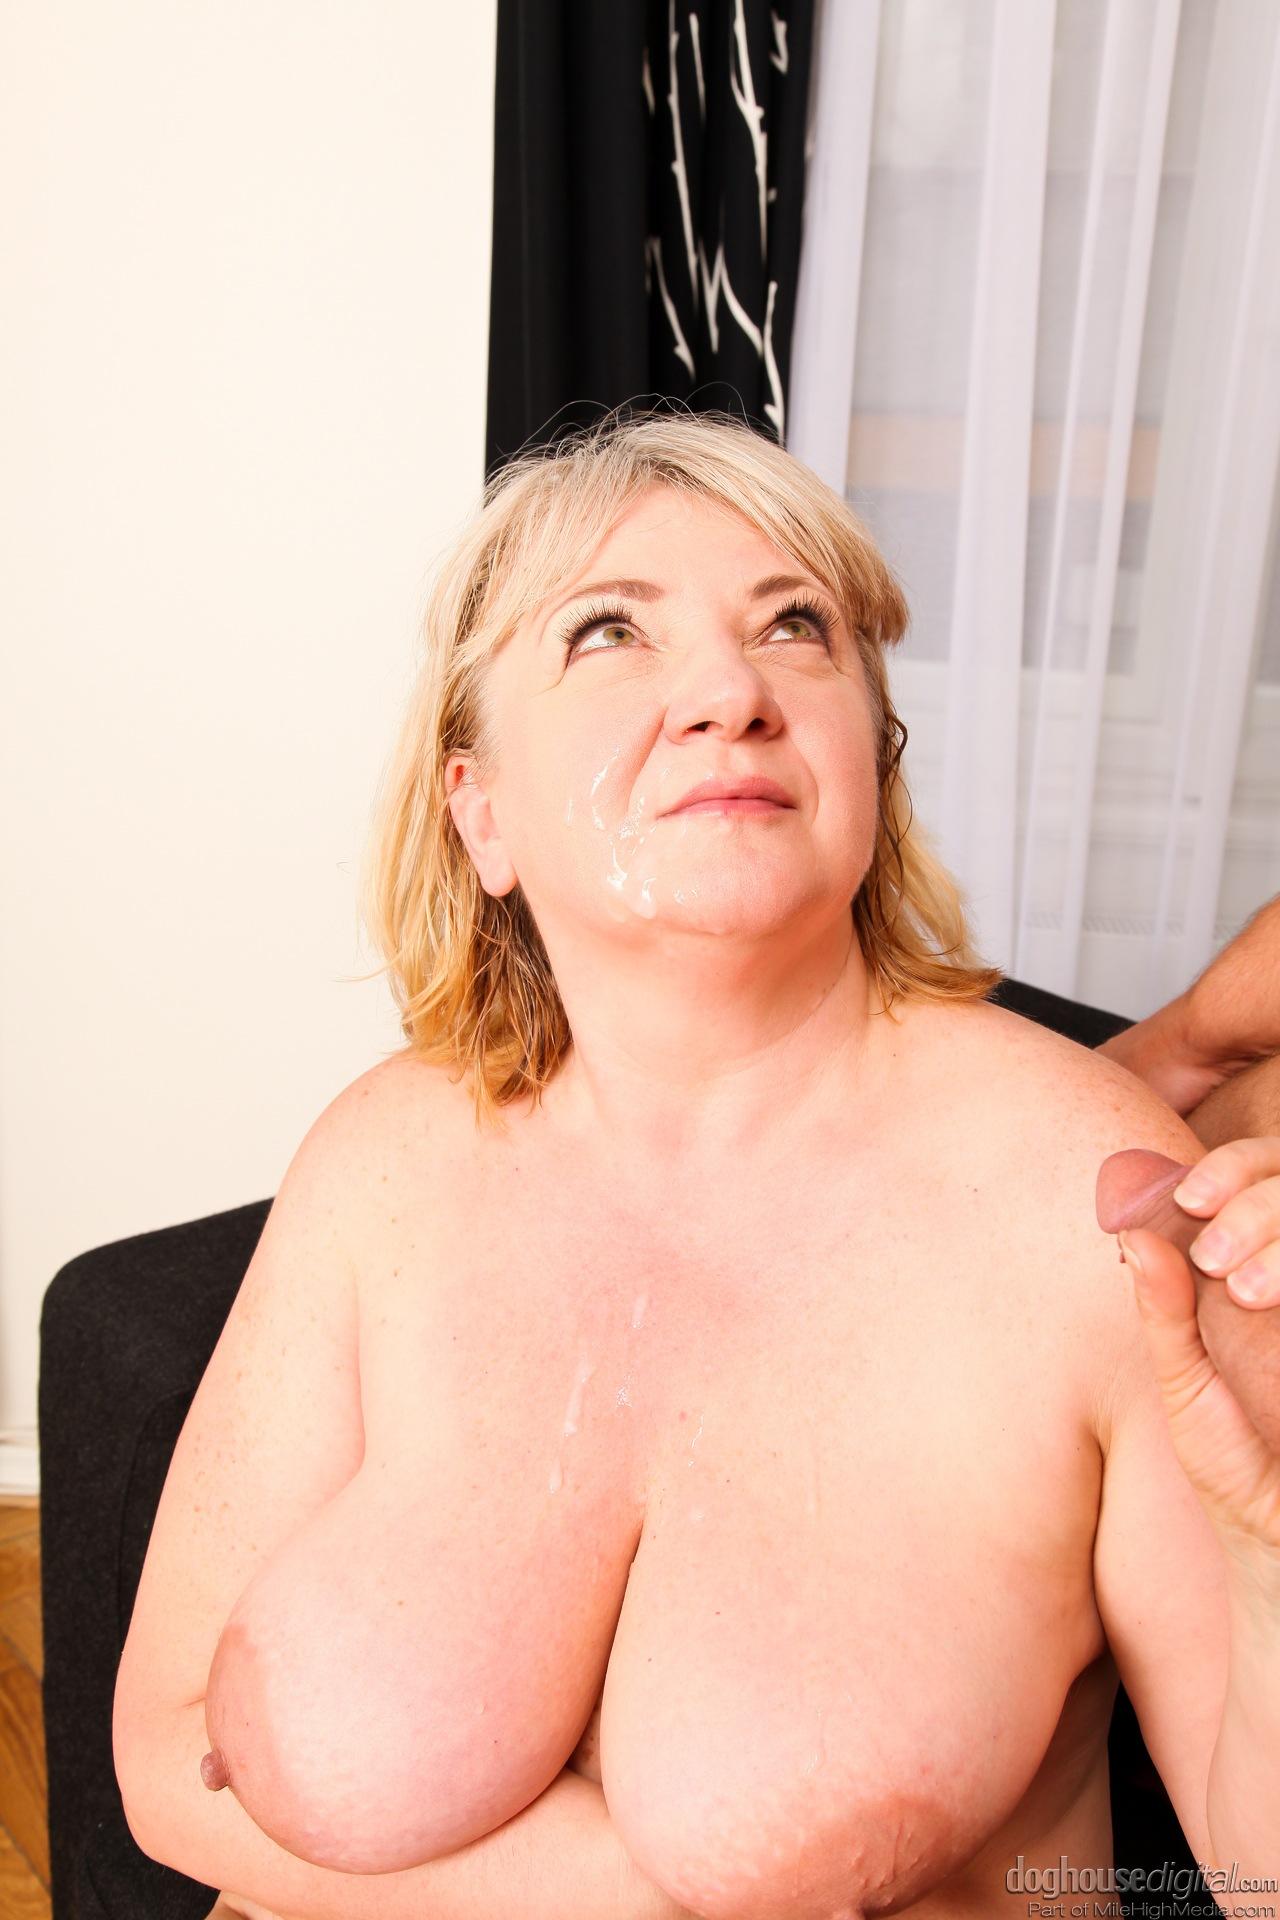 Peliculas Porno Detras De Las Camaras De Cassandra Wilde doghouse digital anabel & tarzan 253161 - good sex porn